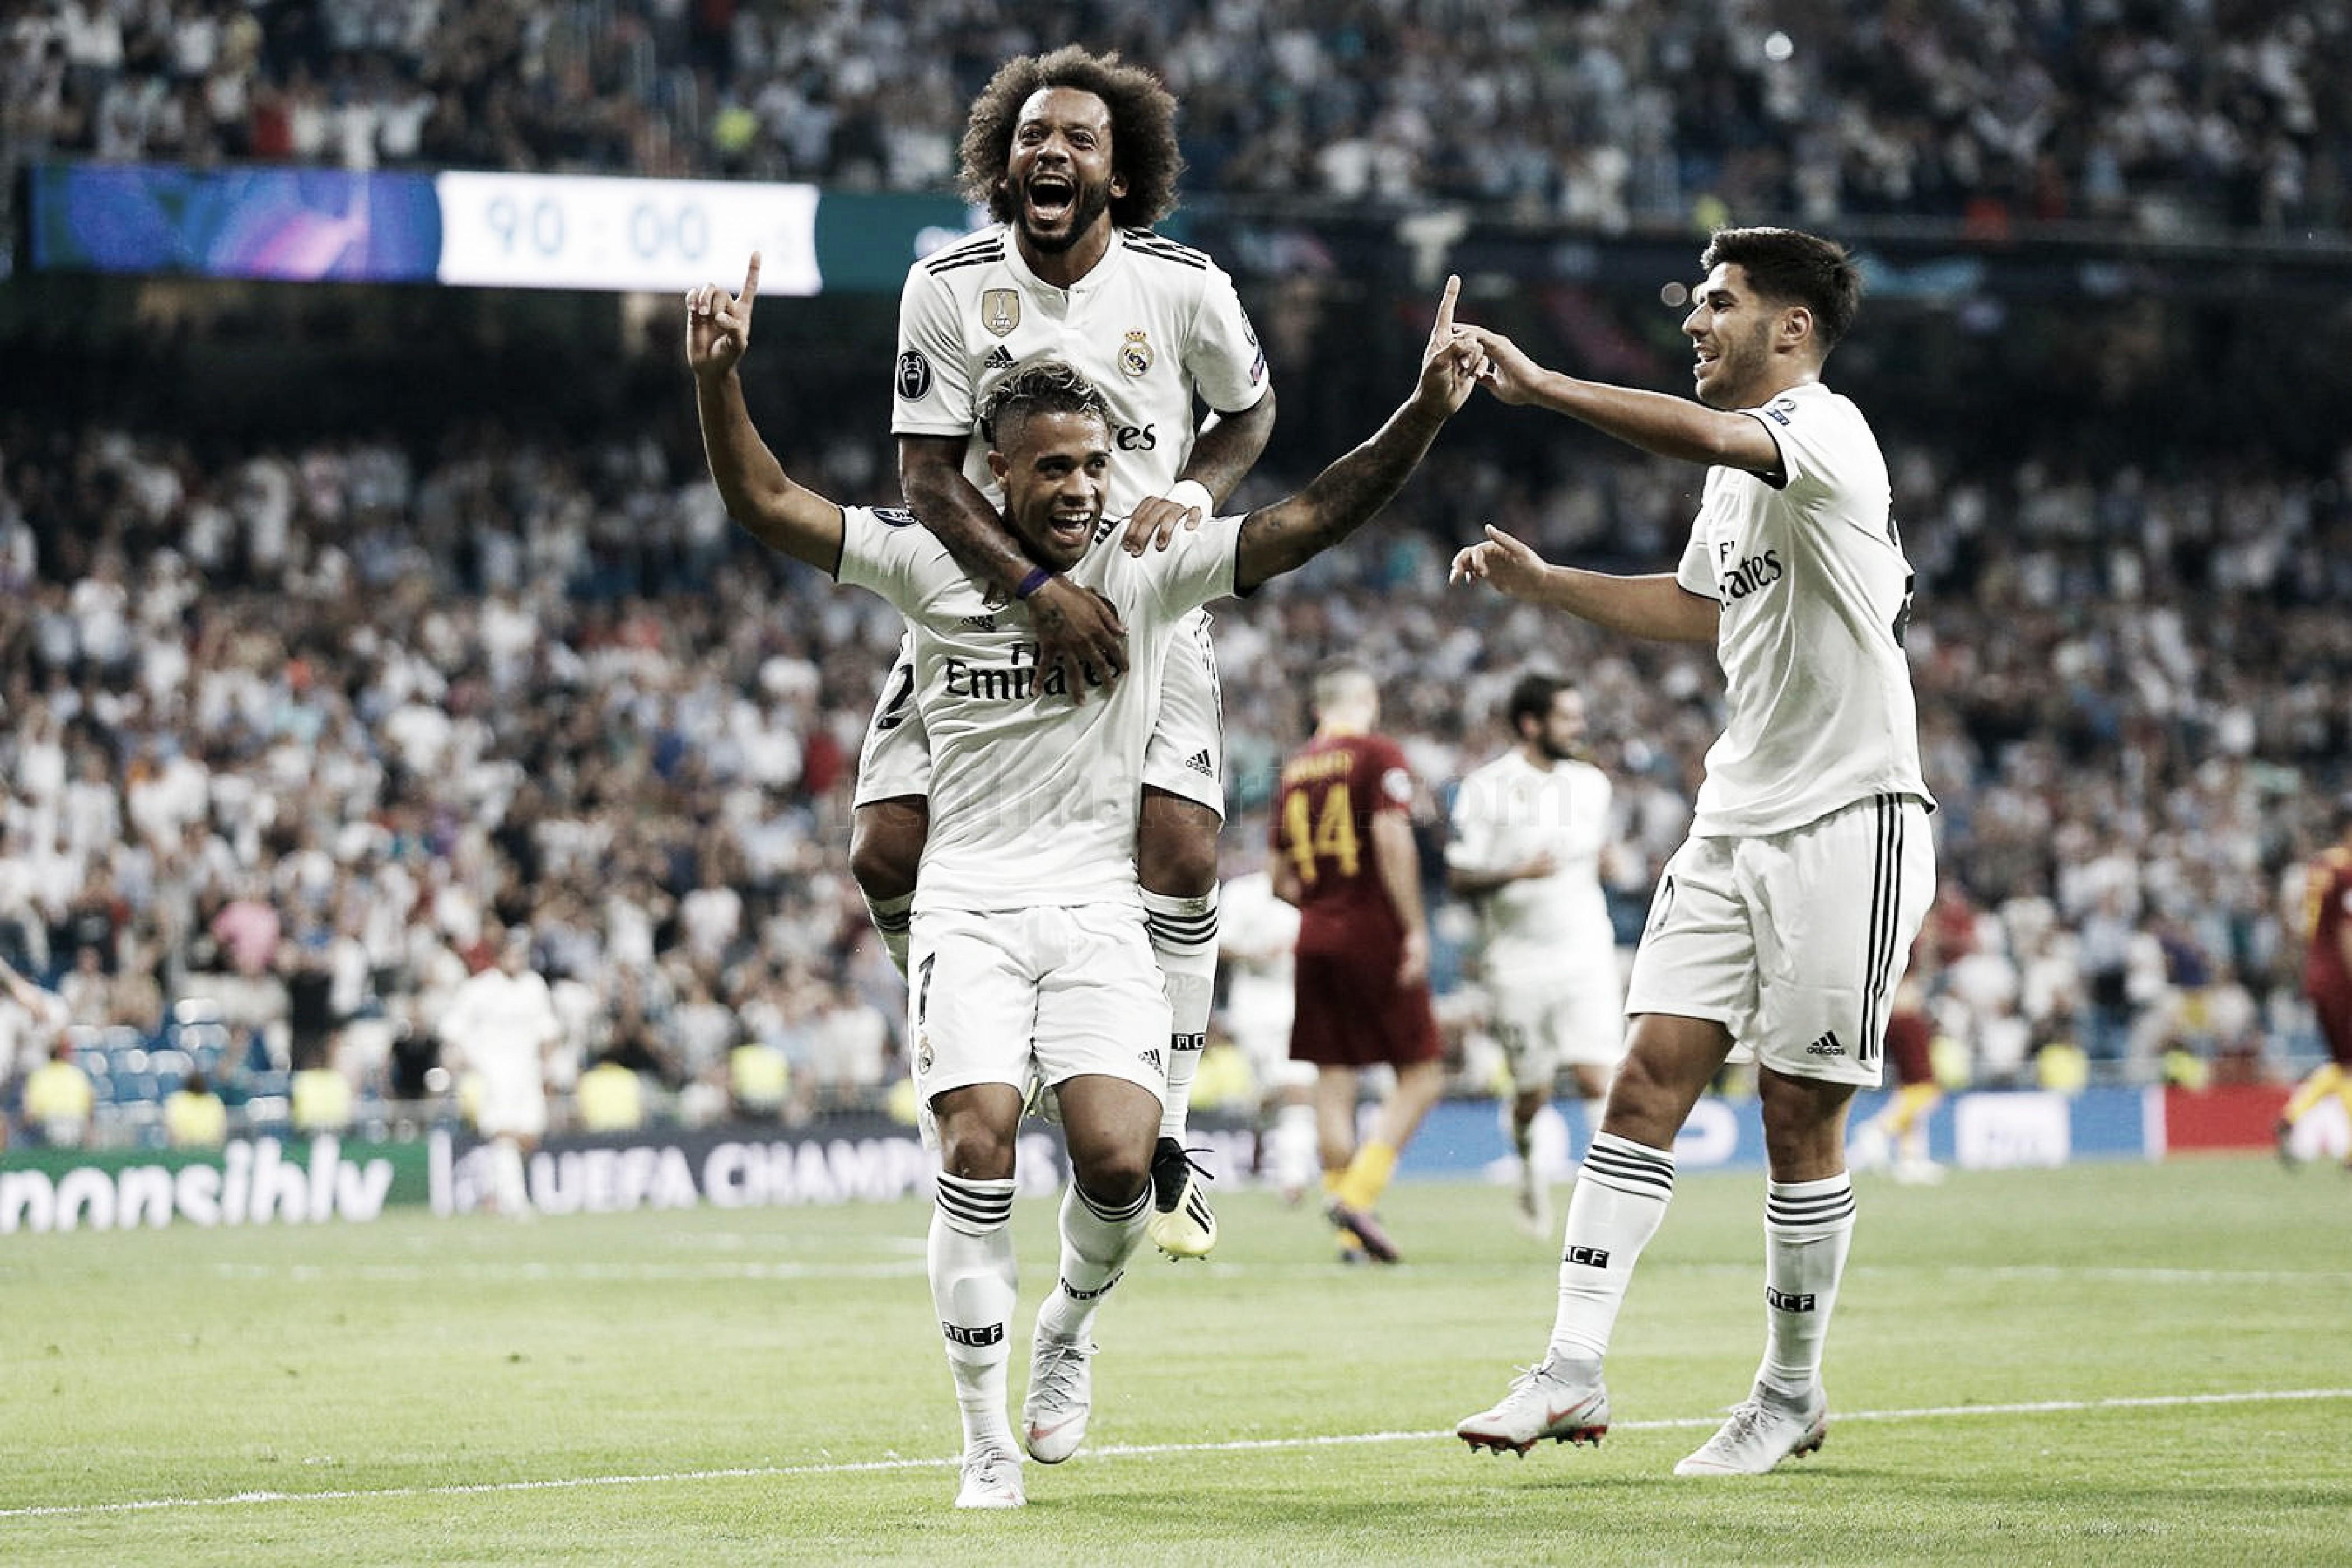 Com pintura de Mariano, Real Madrid vence Roma em casa na Champions League